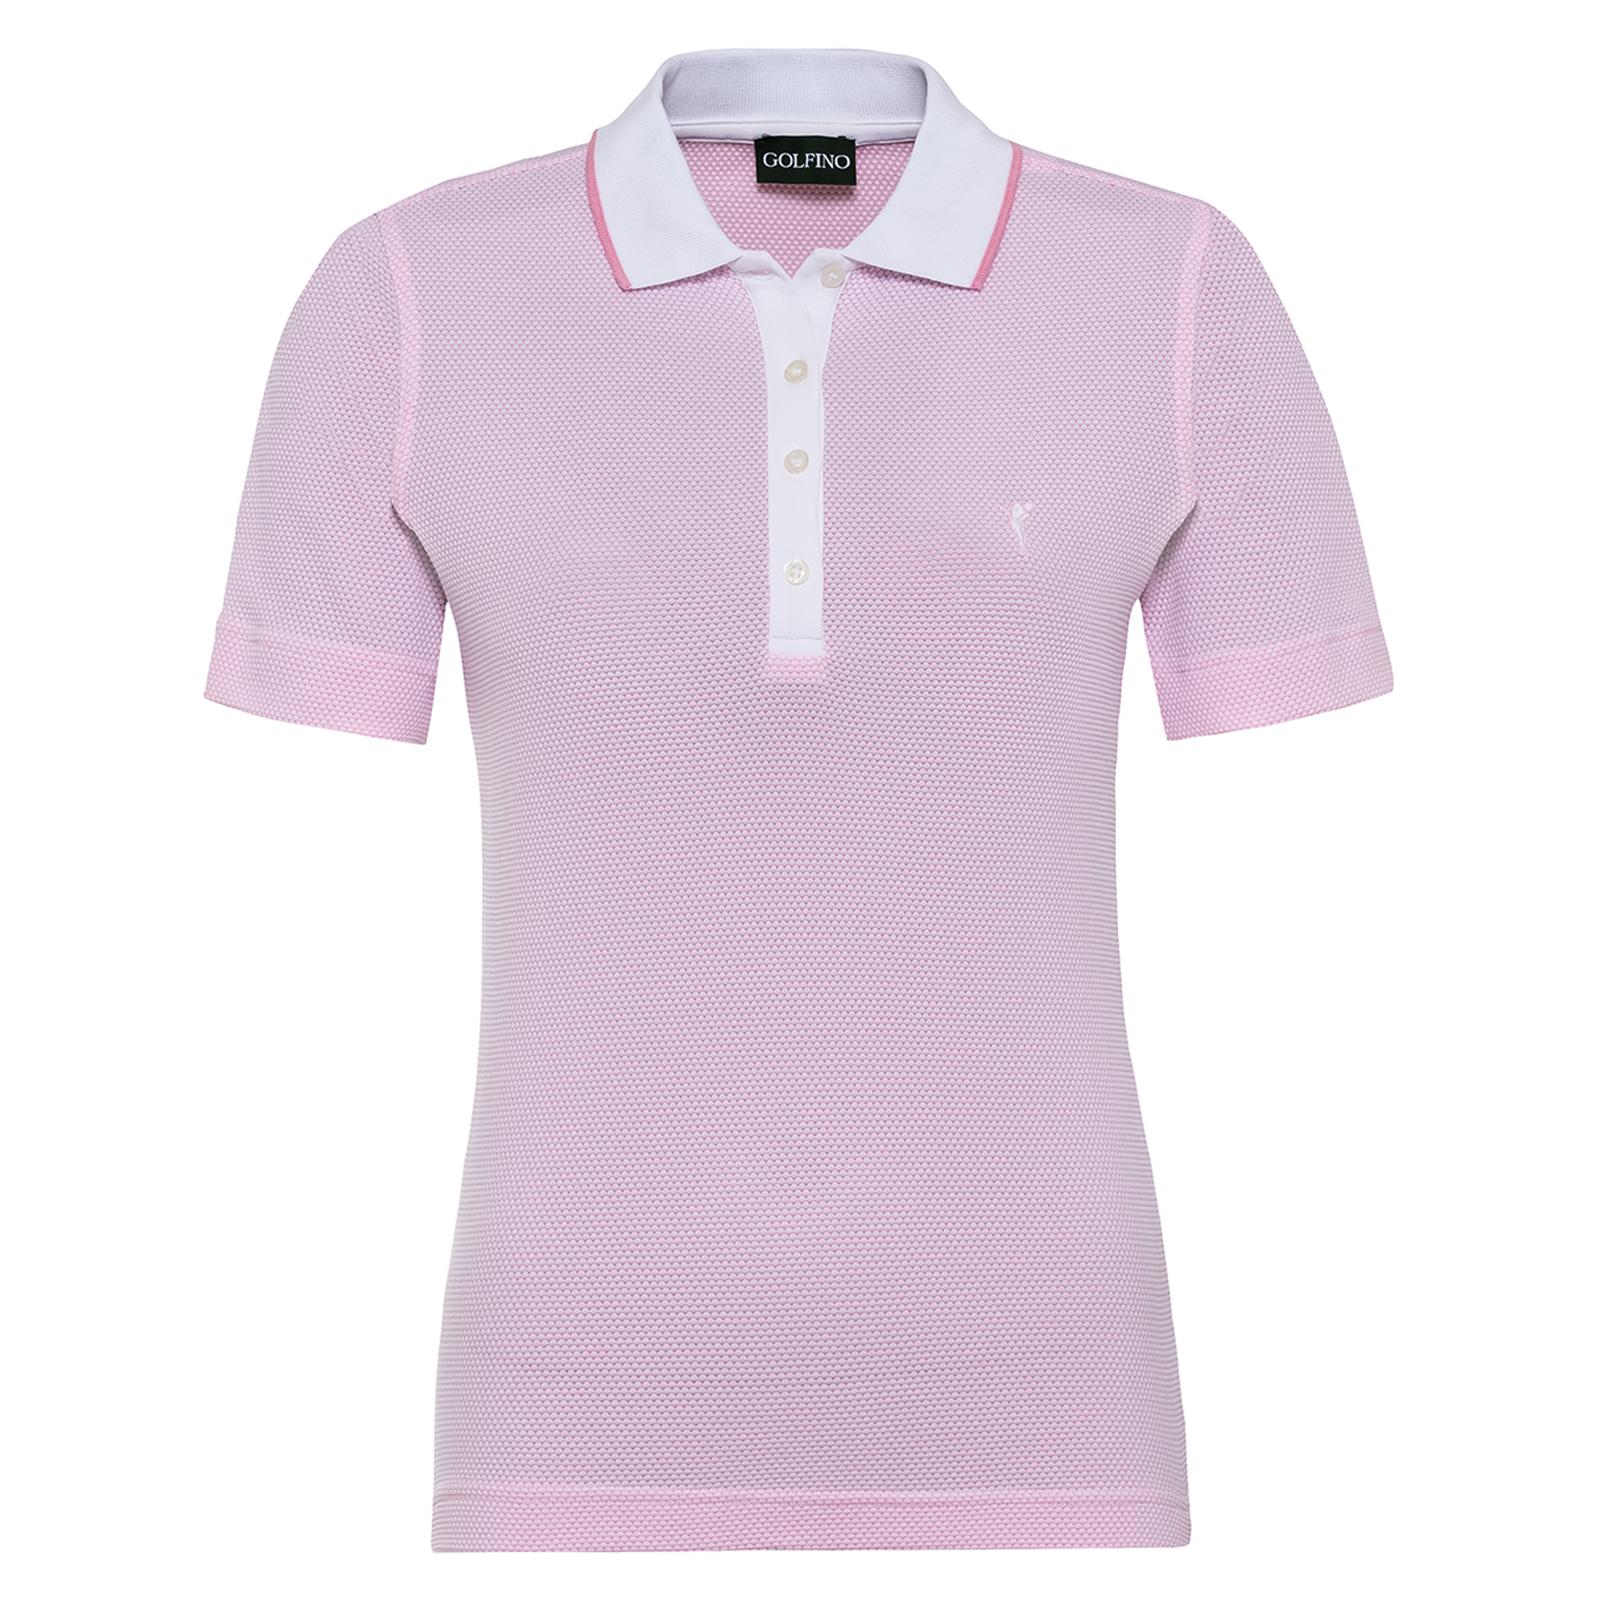 Damen Golfpolo mit Kurzarm aus feuchtigkeitsregulierendem Bubble Jacquard Stoff